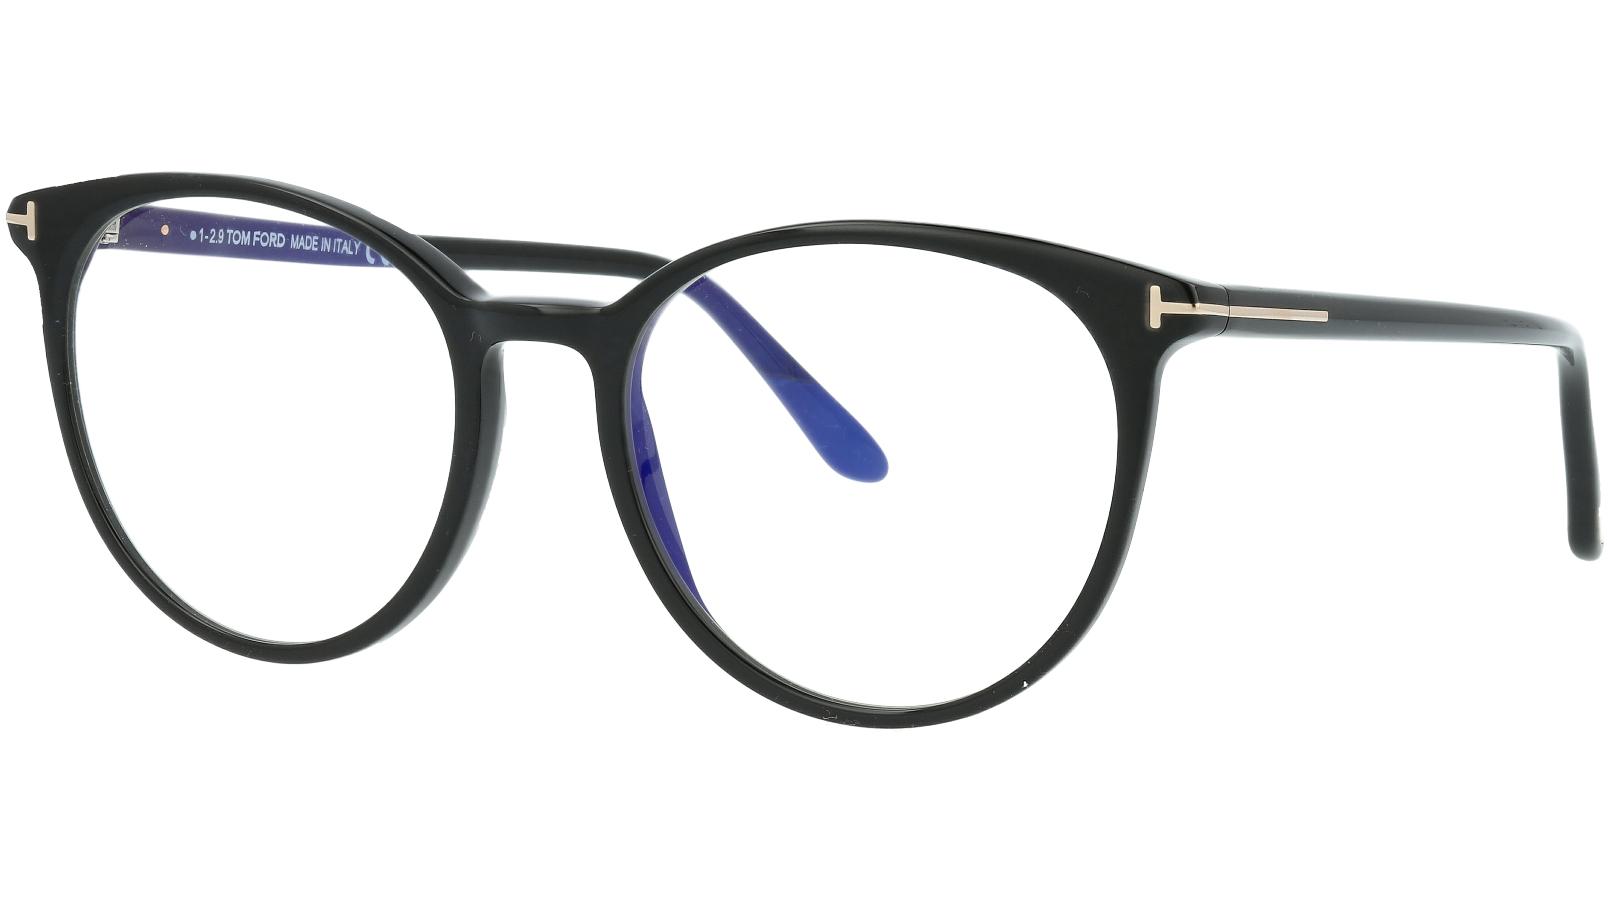 Tom Ford TF5575-B 001 53 Black Glasses